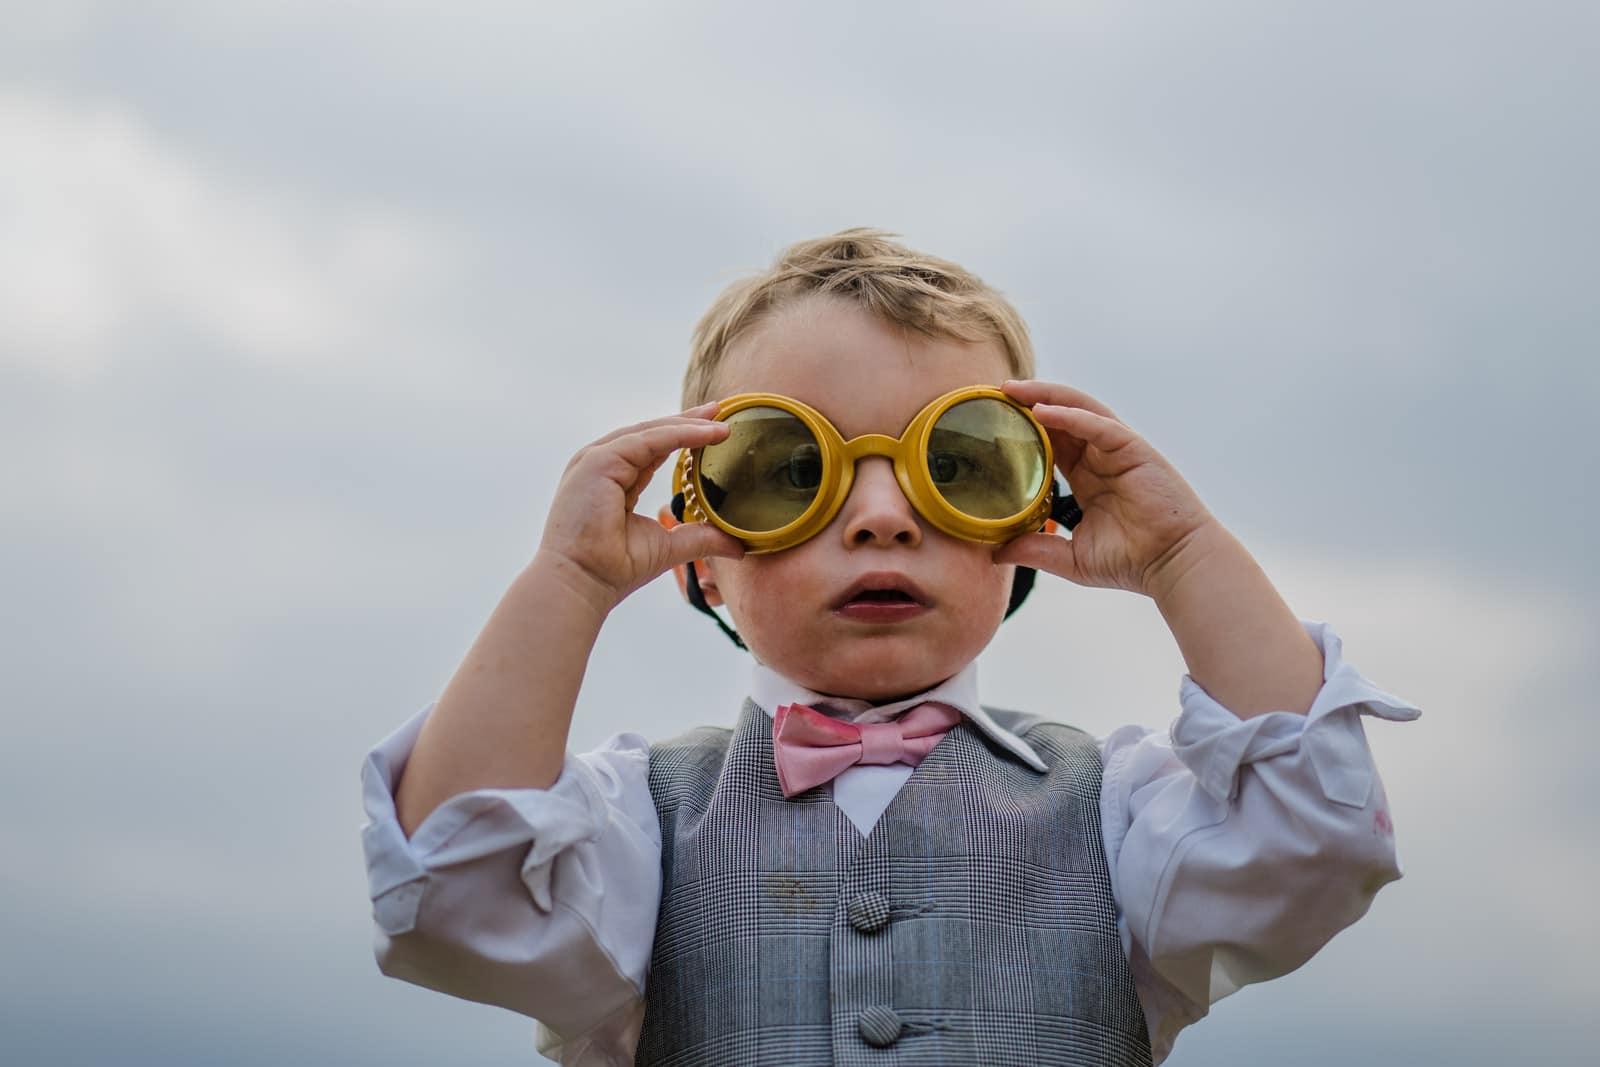 Wedding guest child adjusting his glasses